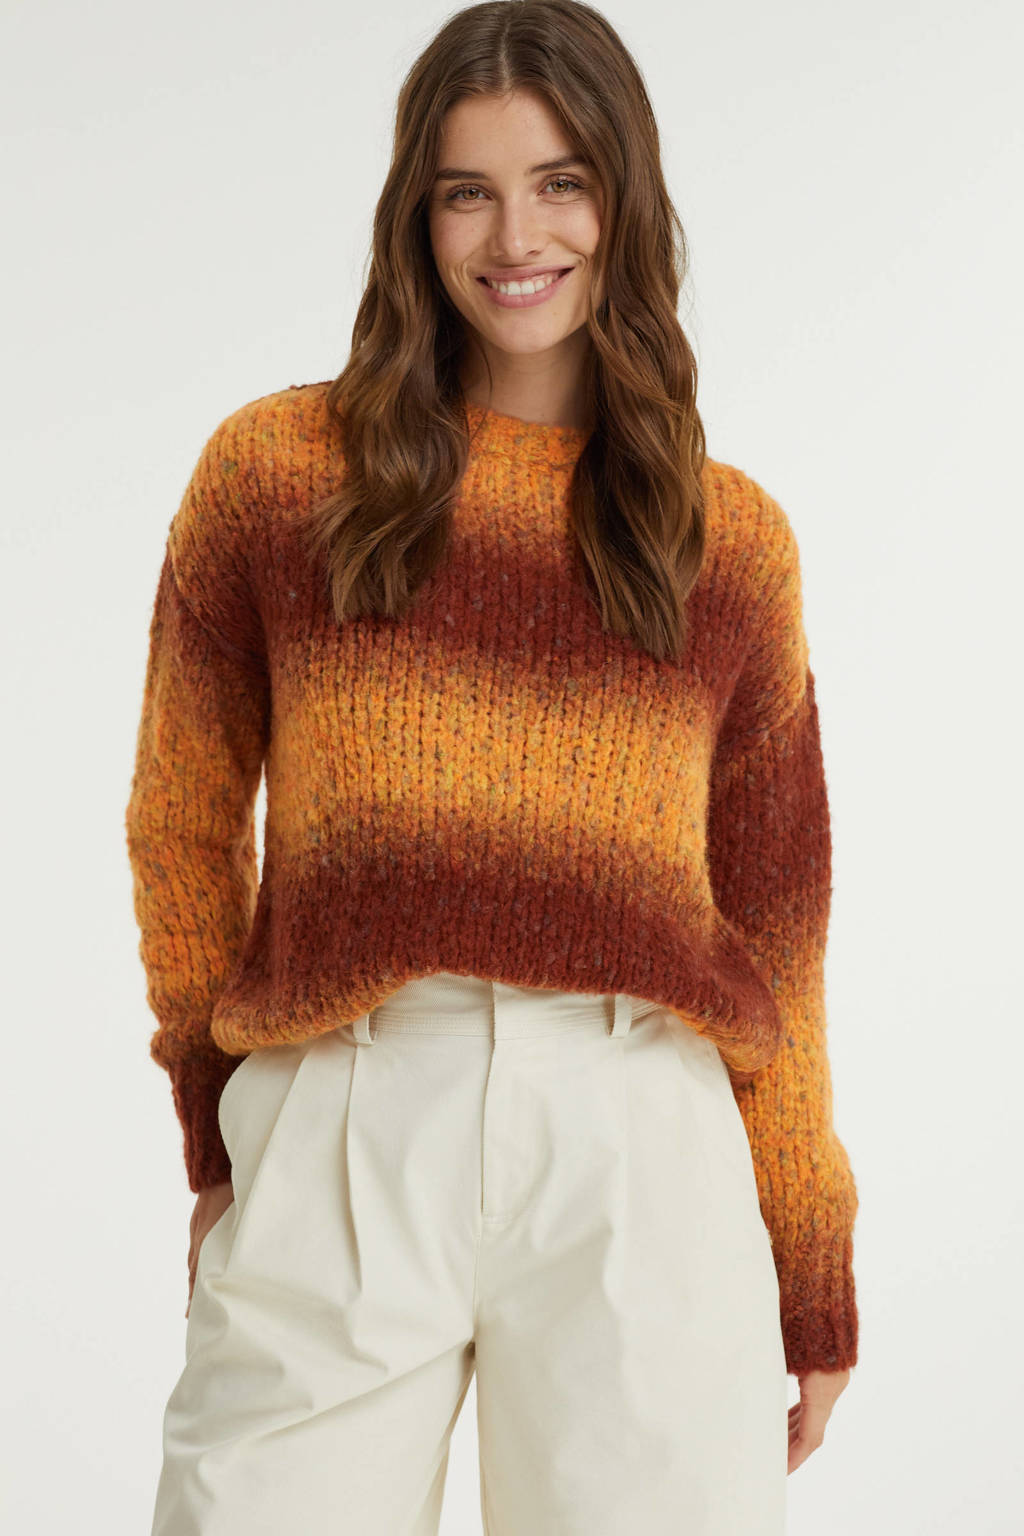 Anna Blue gebreide trui met wol oranje/rood, Oranje/rood